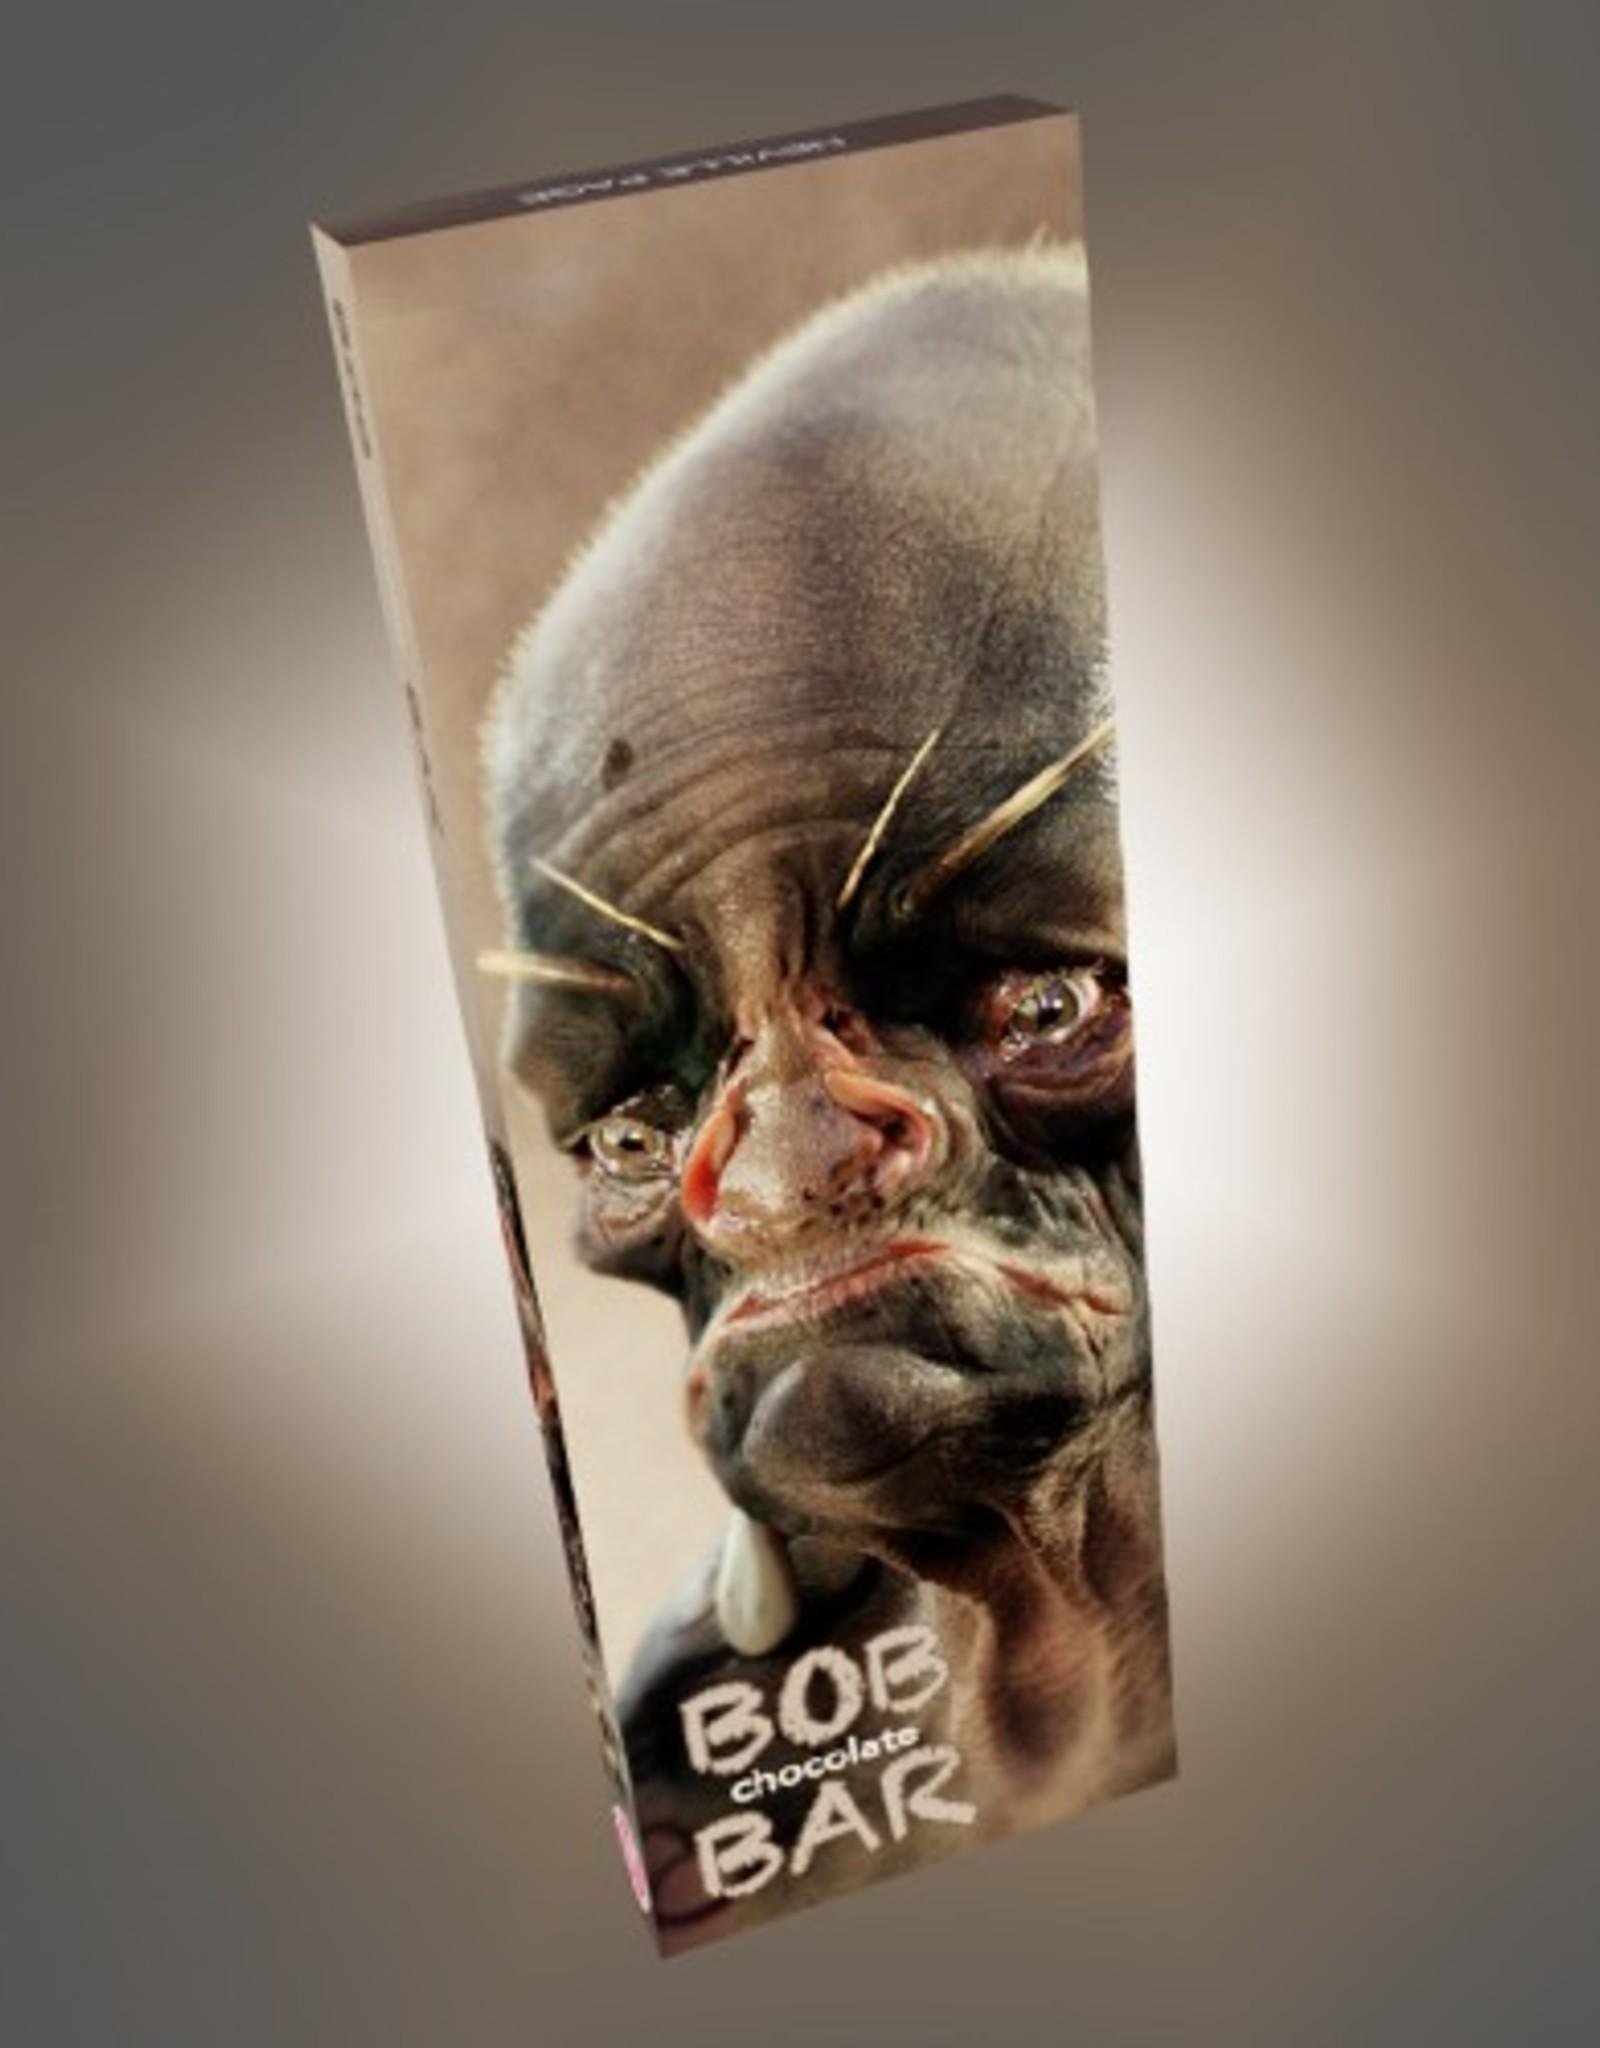 Bob Chocolate Bar - Sad